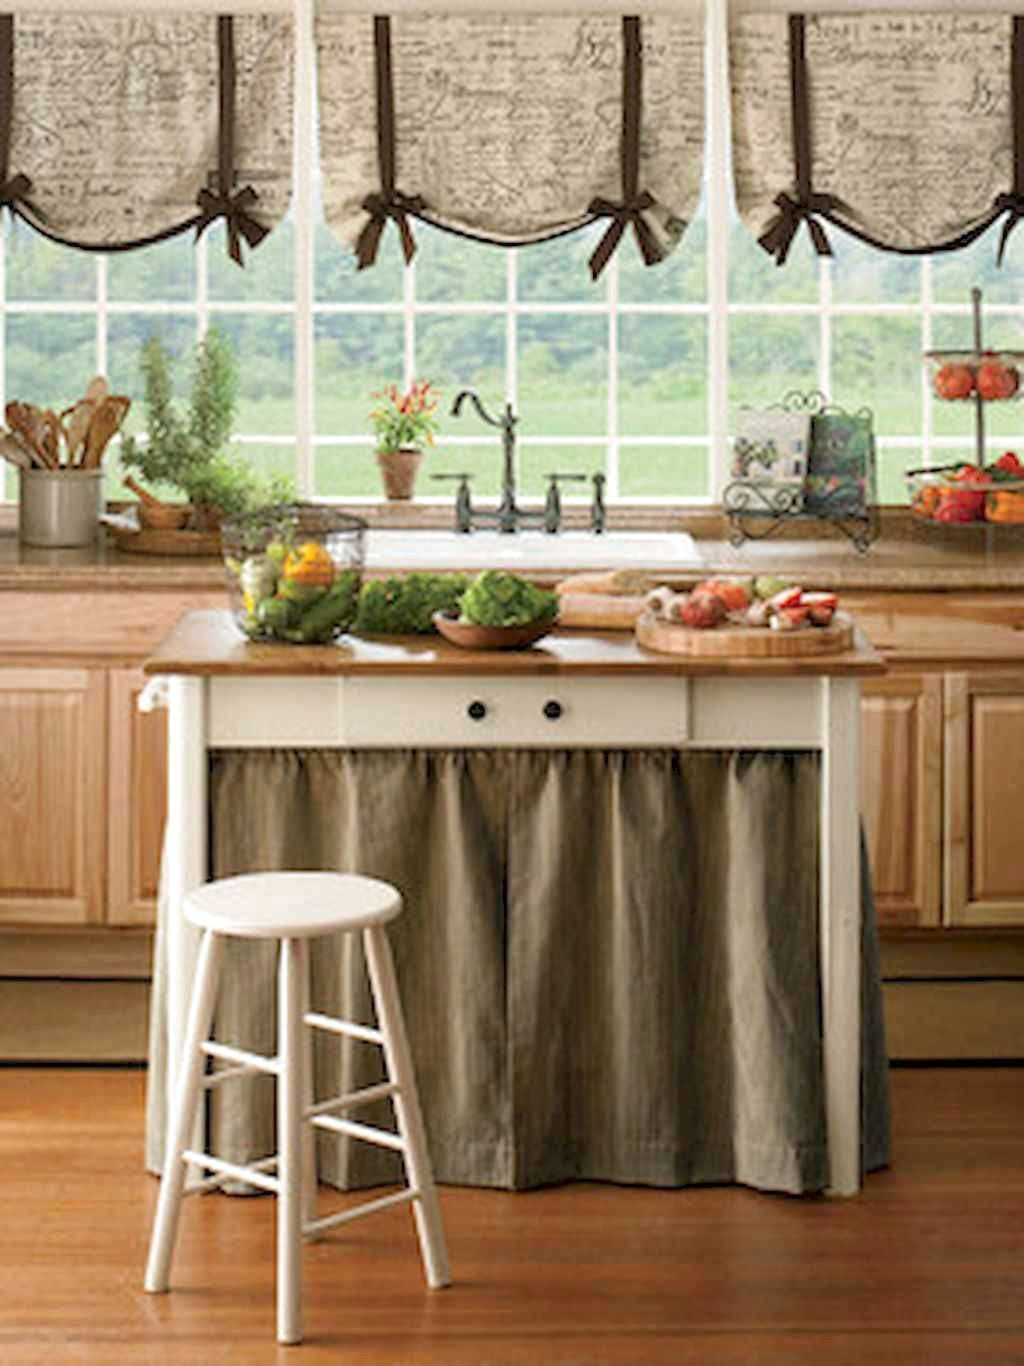 favorite farmhouse kitchen curtains decor ideas frugal living farmhouse kitchen curtains on farmhouse kitchen valance ideas id=58349